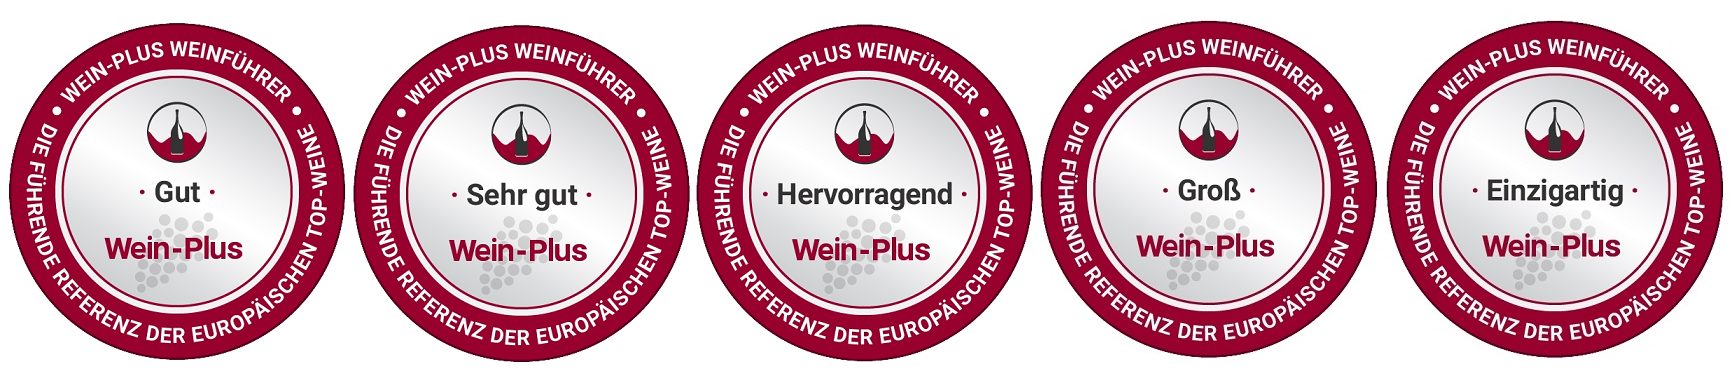 Wine rating - wine plus: good, very good, excellent, big, unique